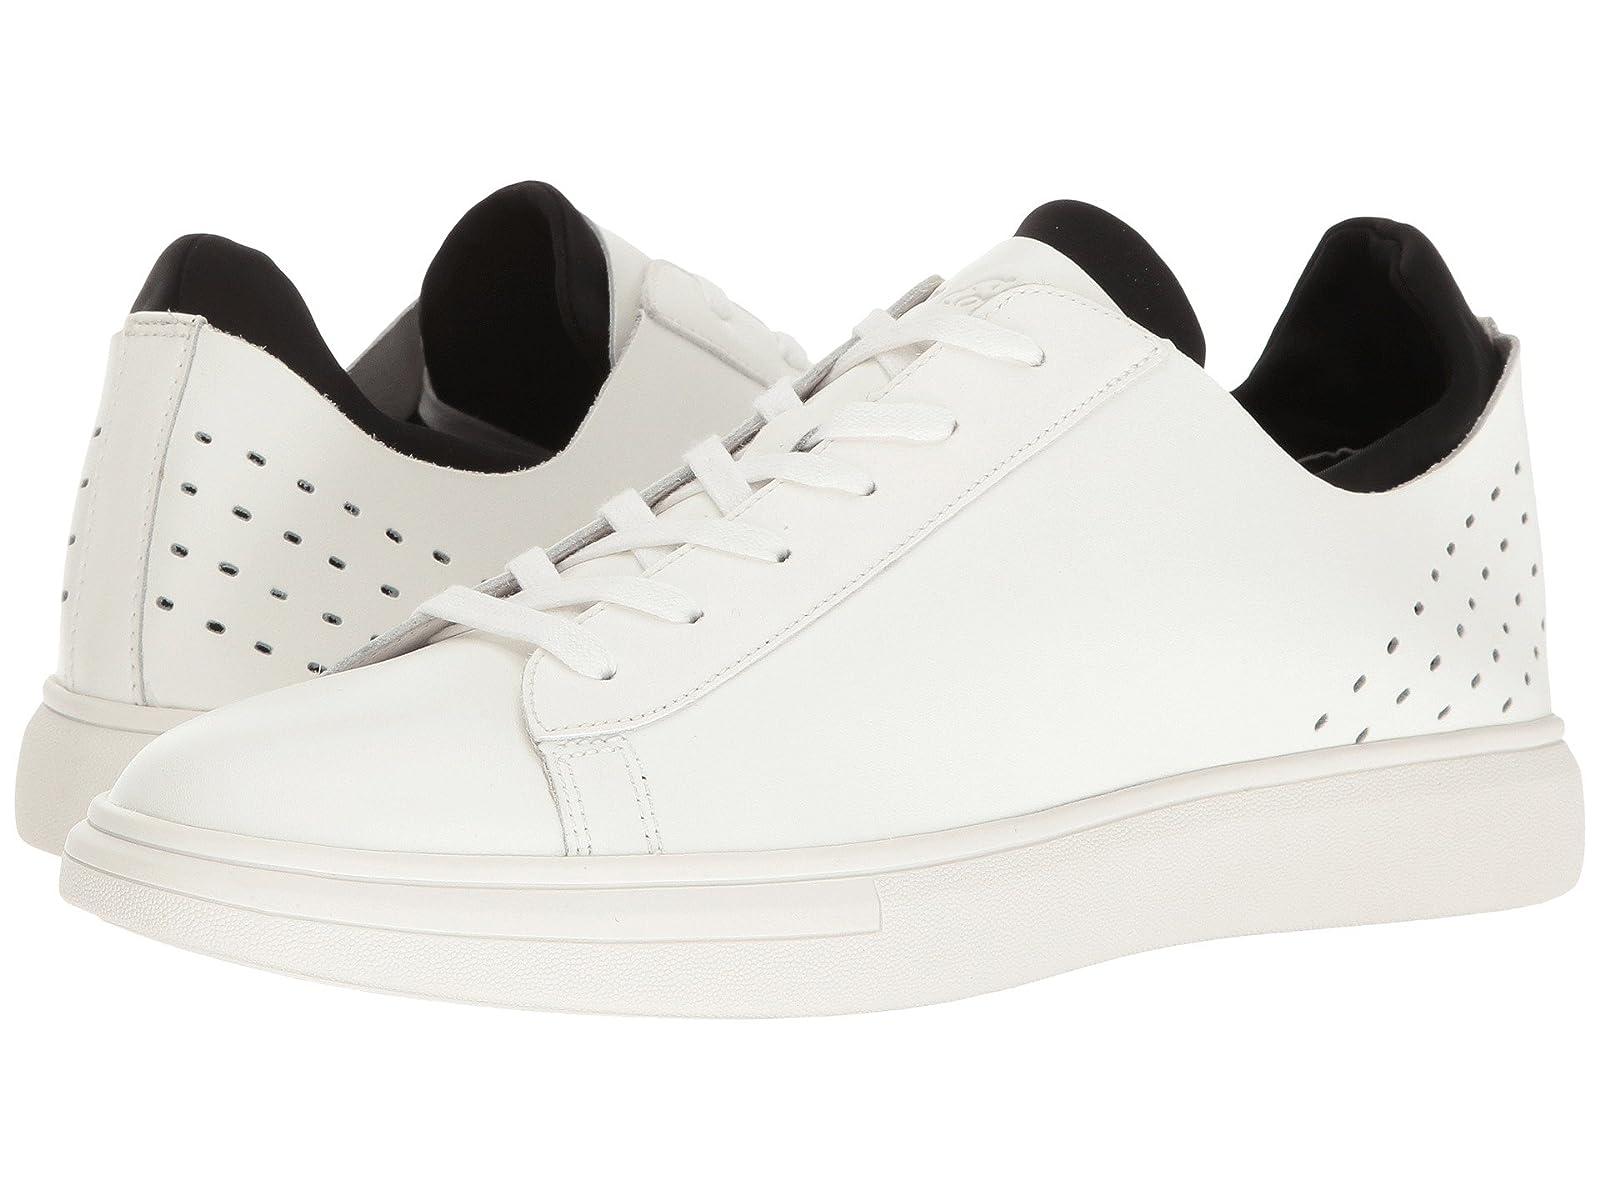 Sam Edelman JaredCheap and distinctive eye-catching shoes